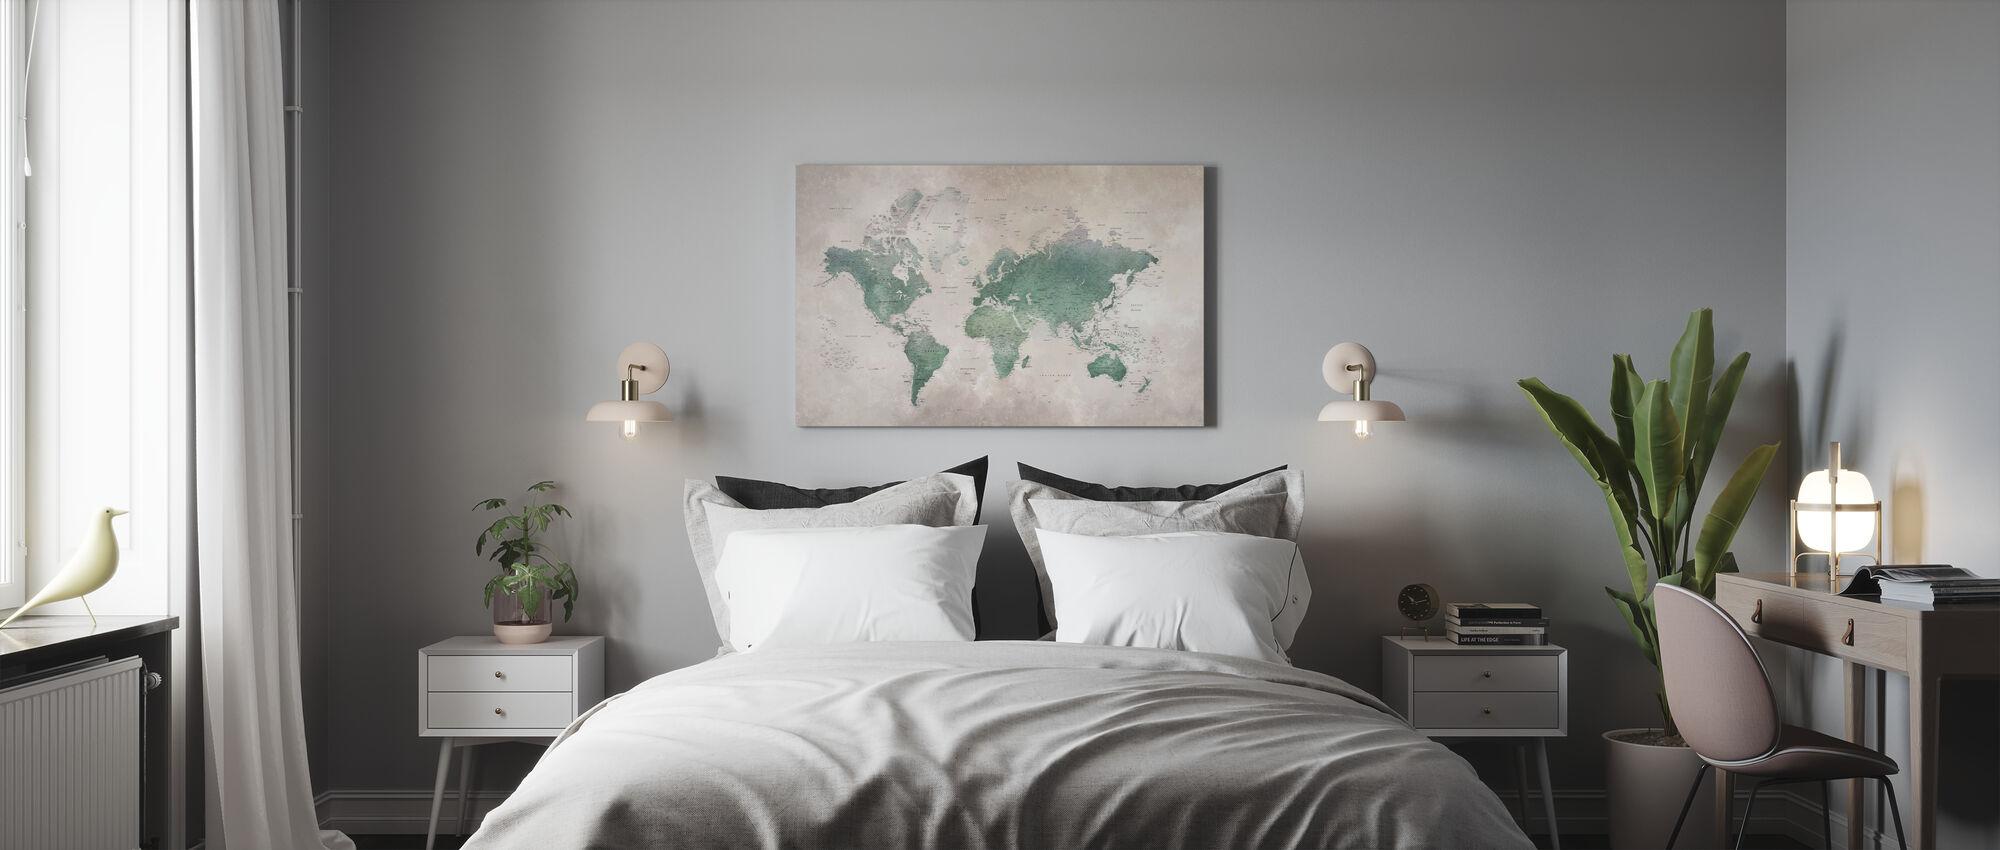 Weltkarte - Emerald - Leinwandbild - Schlafzimmer